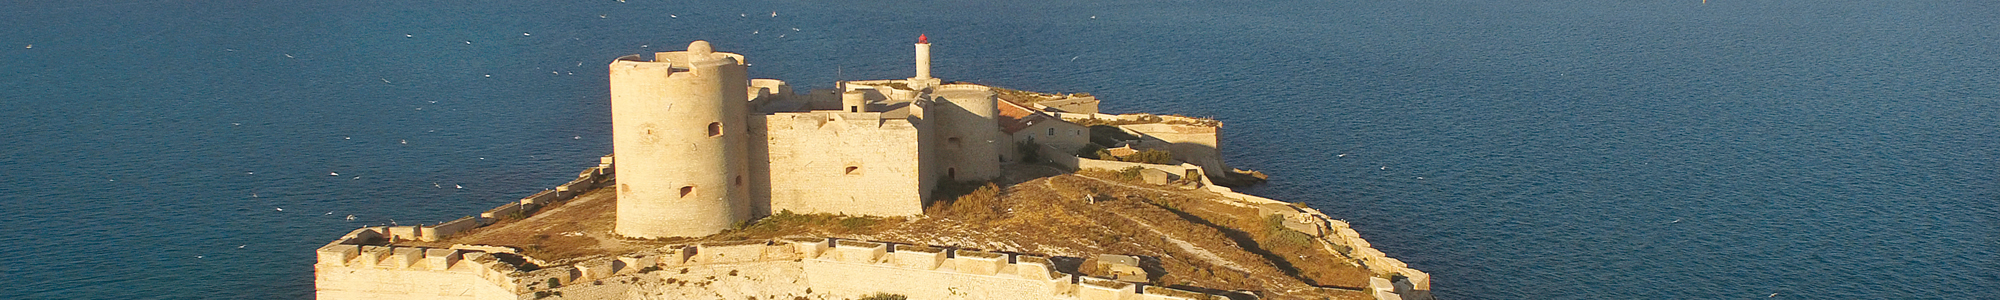 Château d'if Marseille Adresse clé